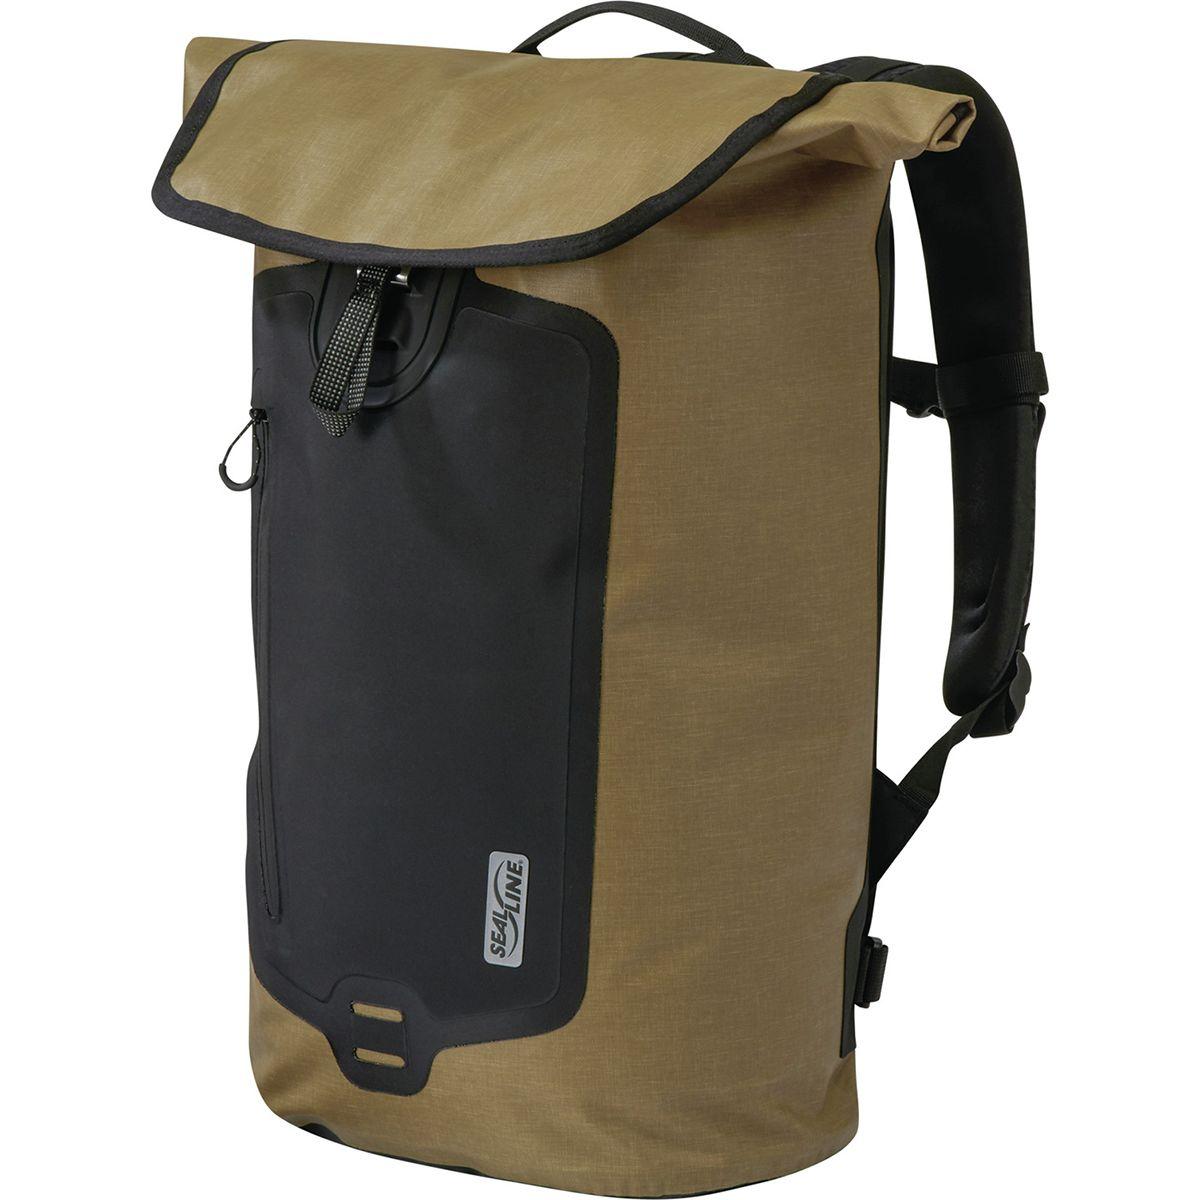 SealLine Urban Dry Daypack